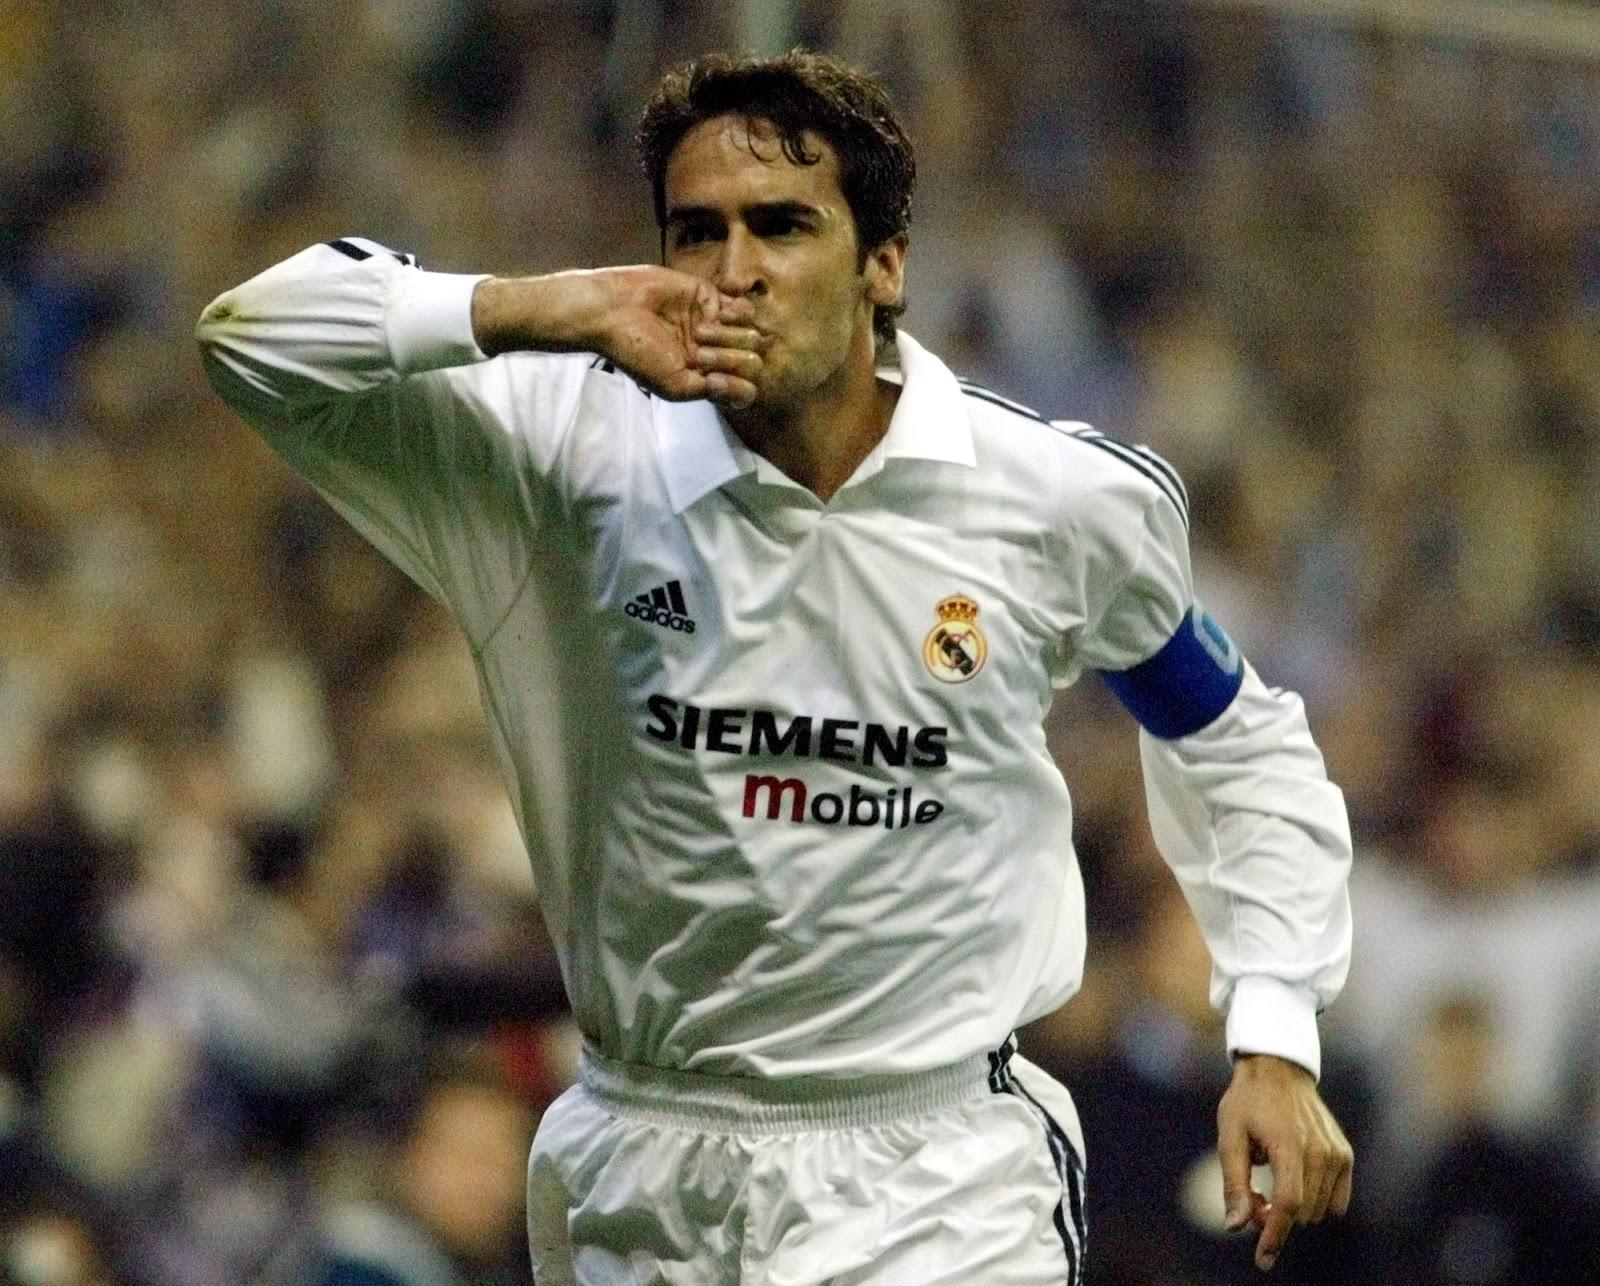 Orgullo Madridista : Leyendas del Madridismo: Raúl González Blanco